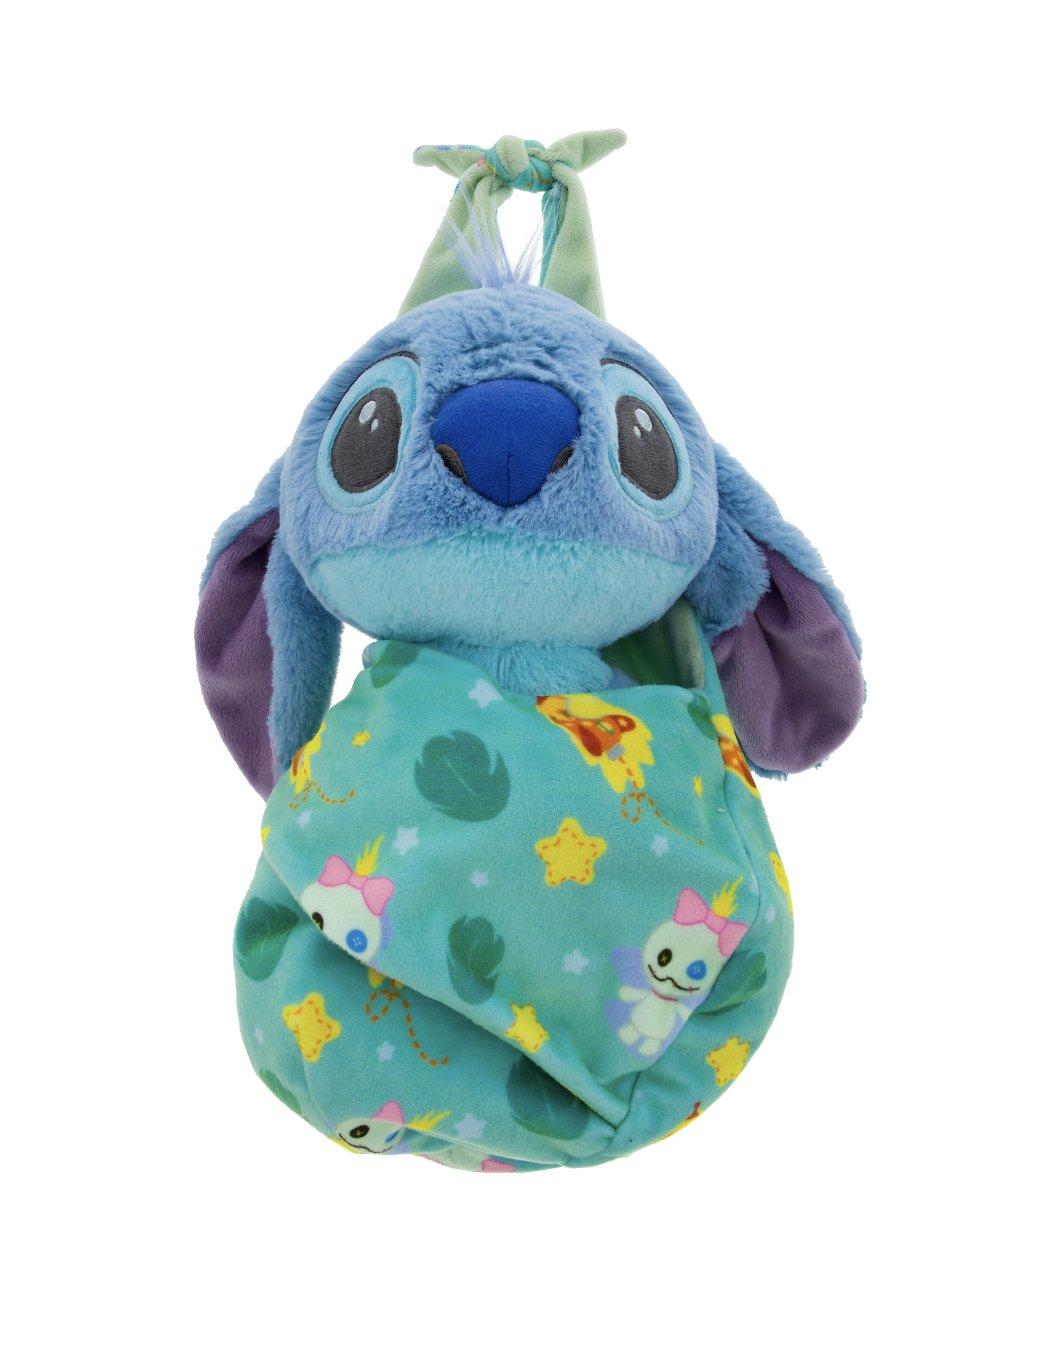 Disney Parks Baby Stitch in a Pouch Blanket Plush Doll by Disney